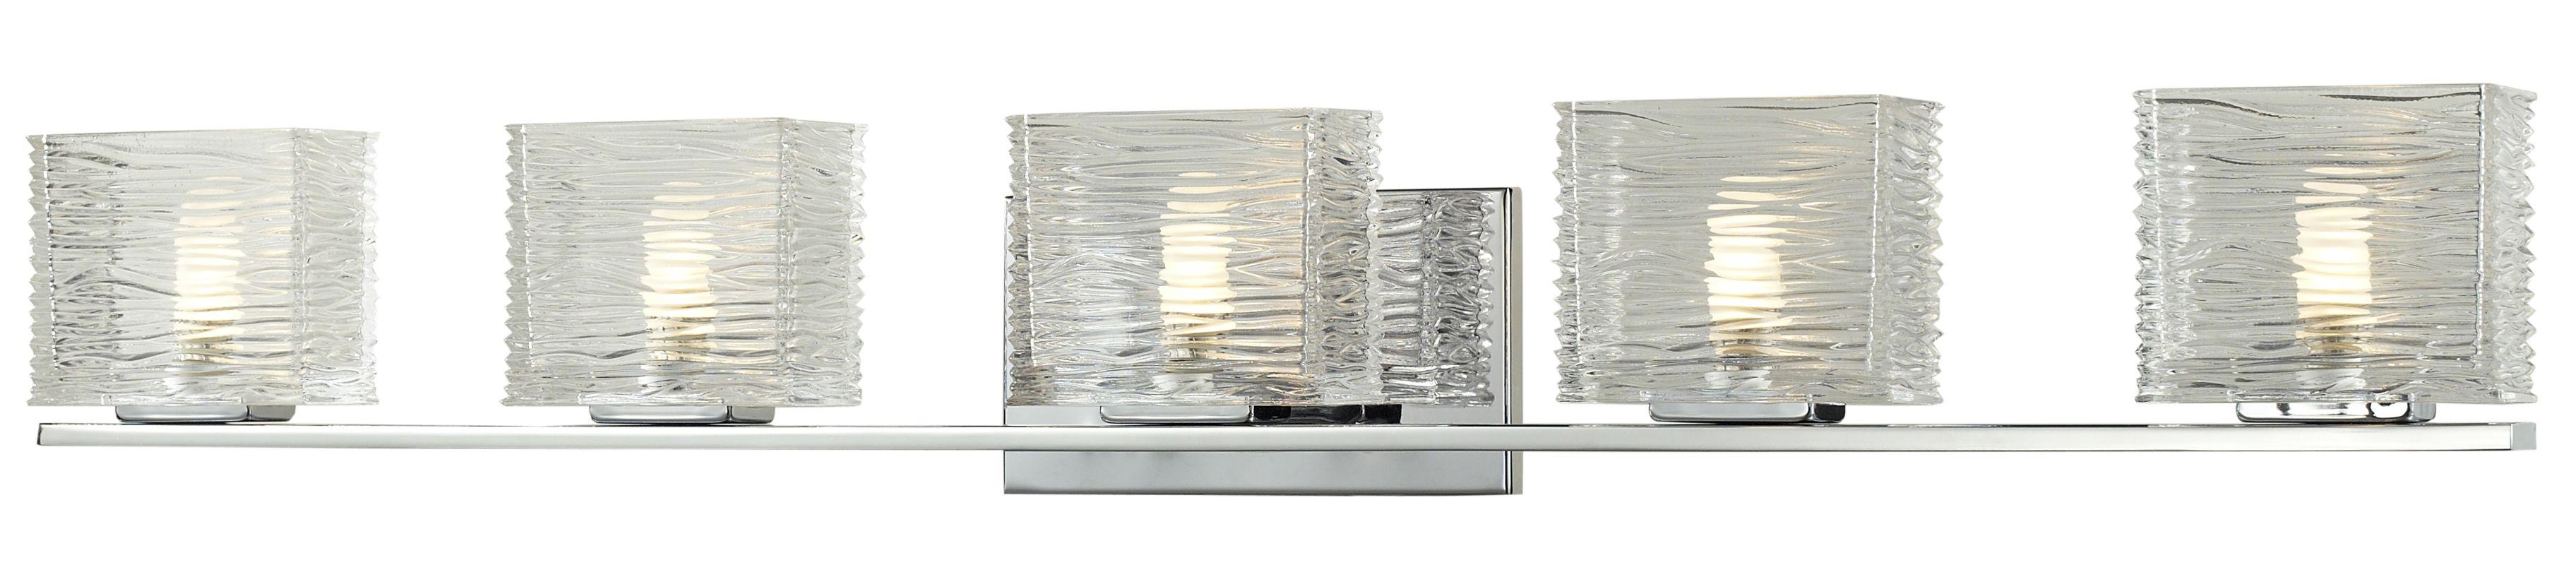 Z-Lite 3025-5V Jaol 5 Light ADA Compliant Bathroom Vanity Light with